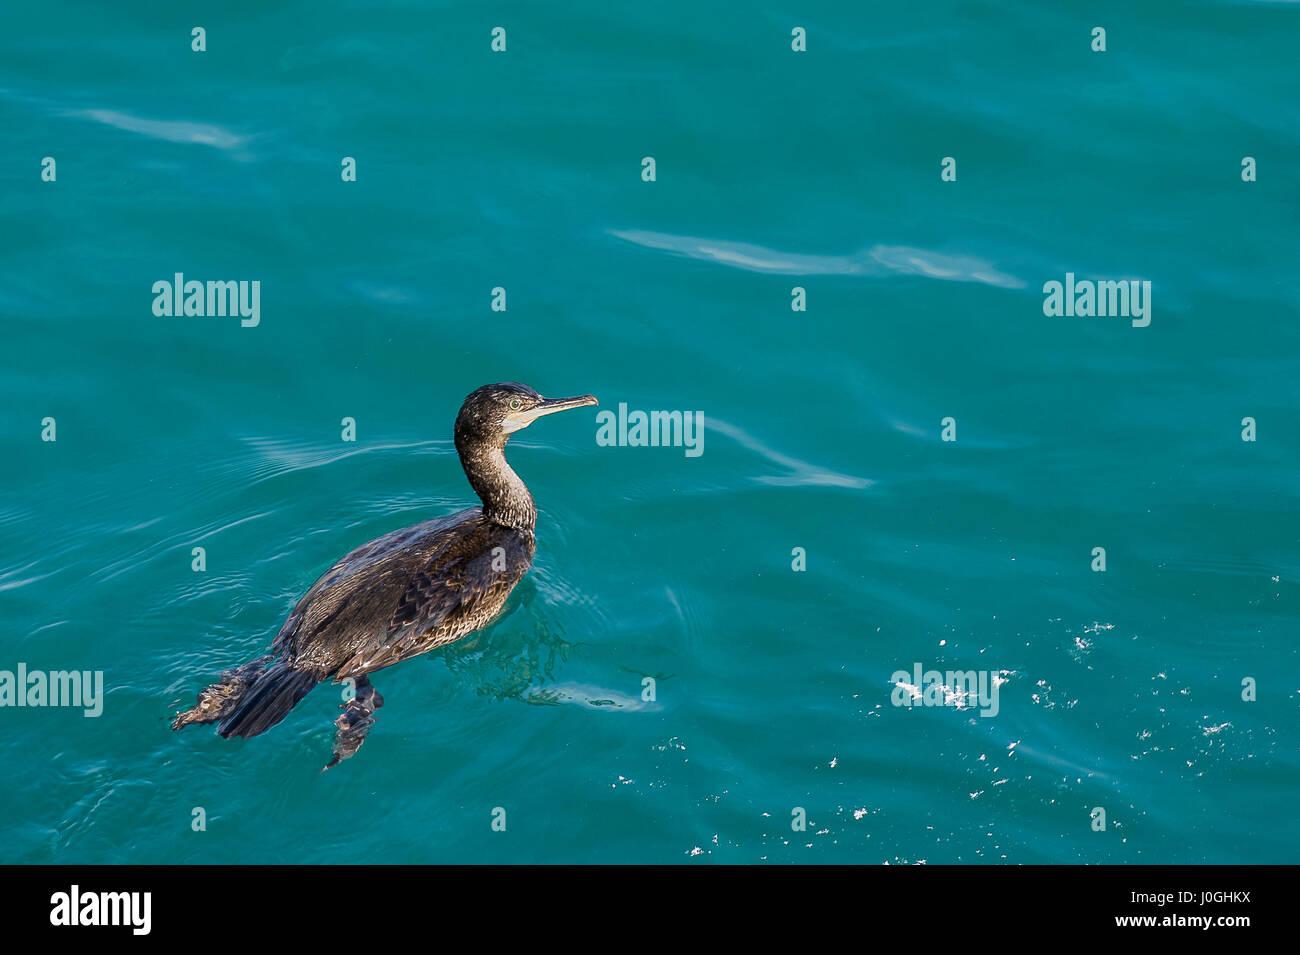 Cormorant; Phalacrocoracidae; Aquatic bird; Water; Sea; Wild bird - Stock Image